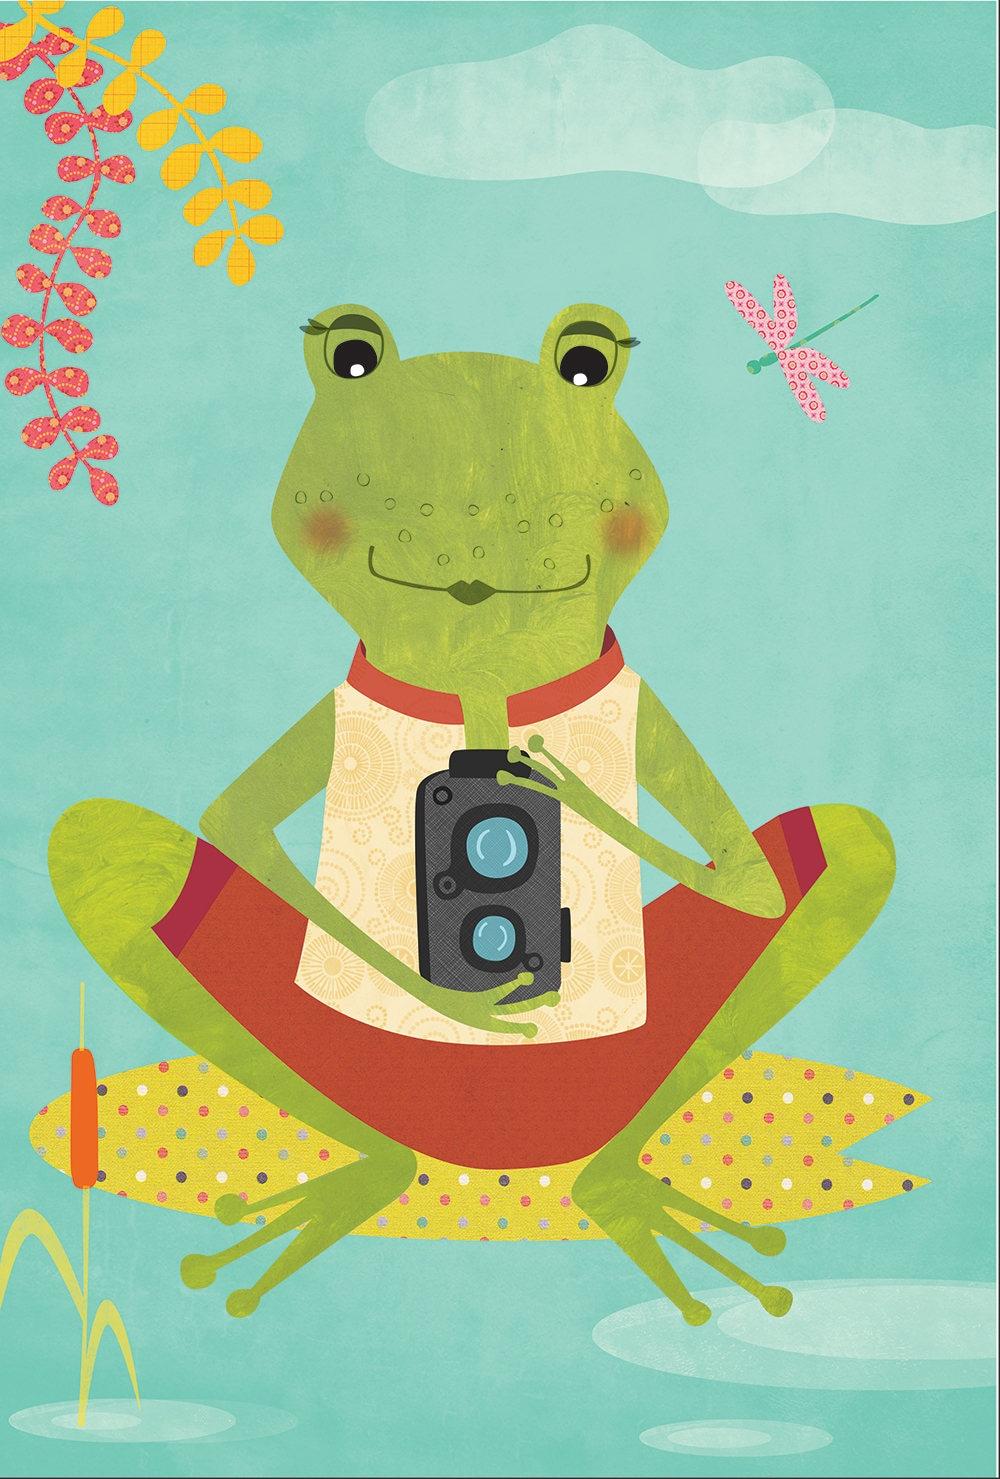 Cute Frog Wall Art Photos - The Wall Art Decorations - mypromoisrich.com